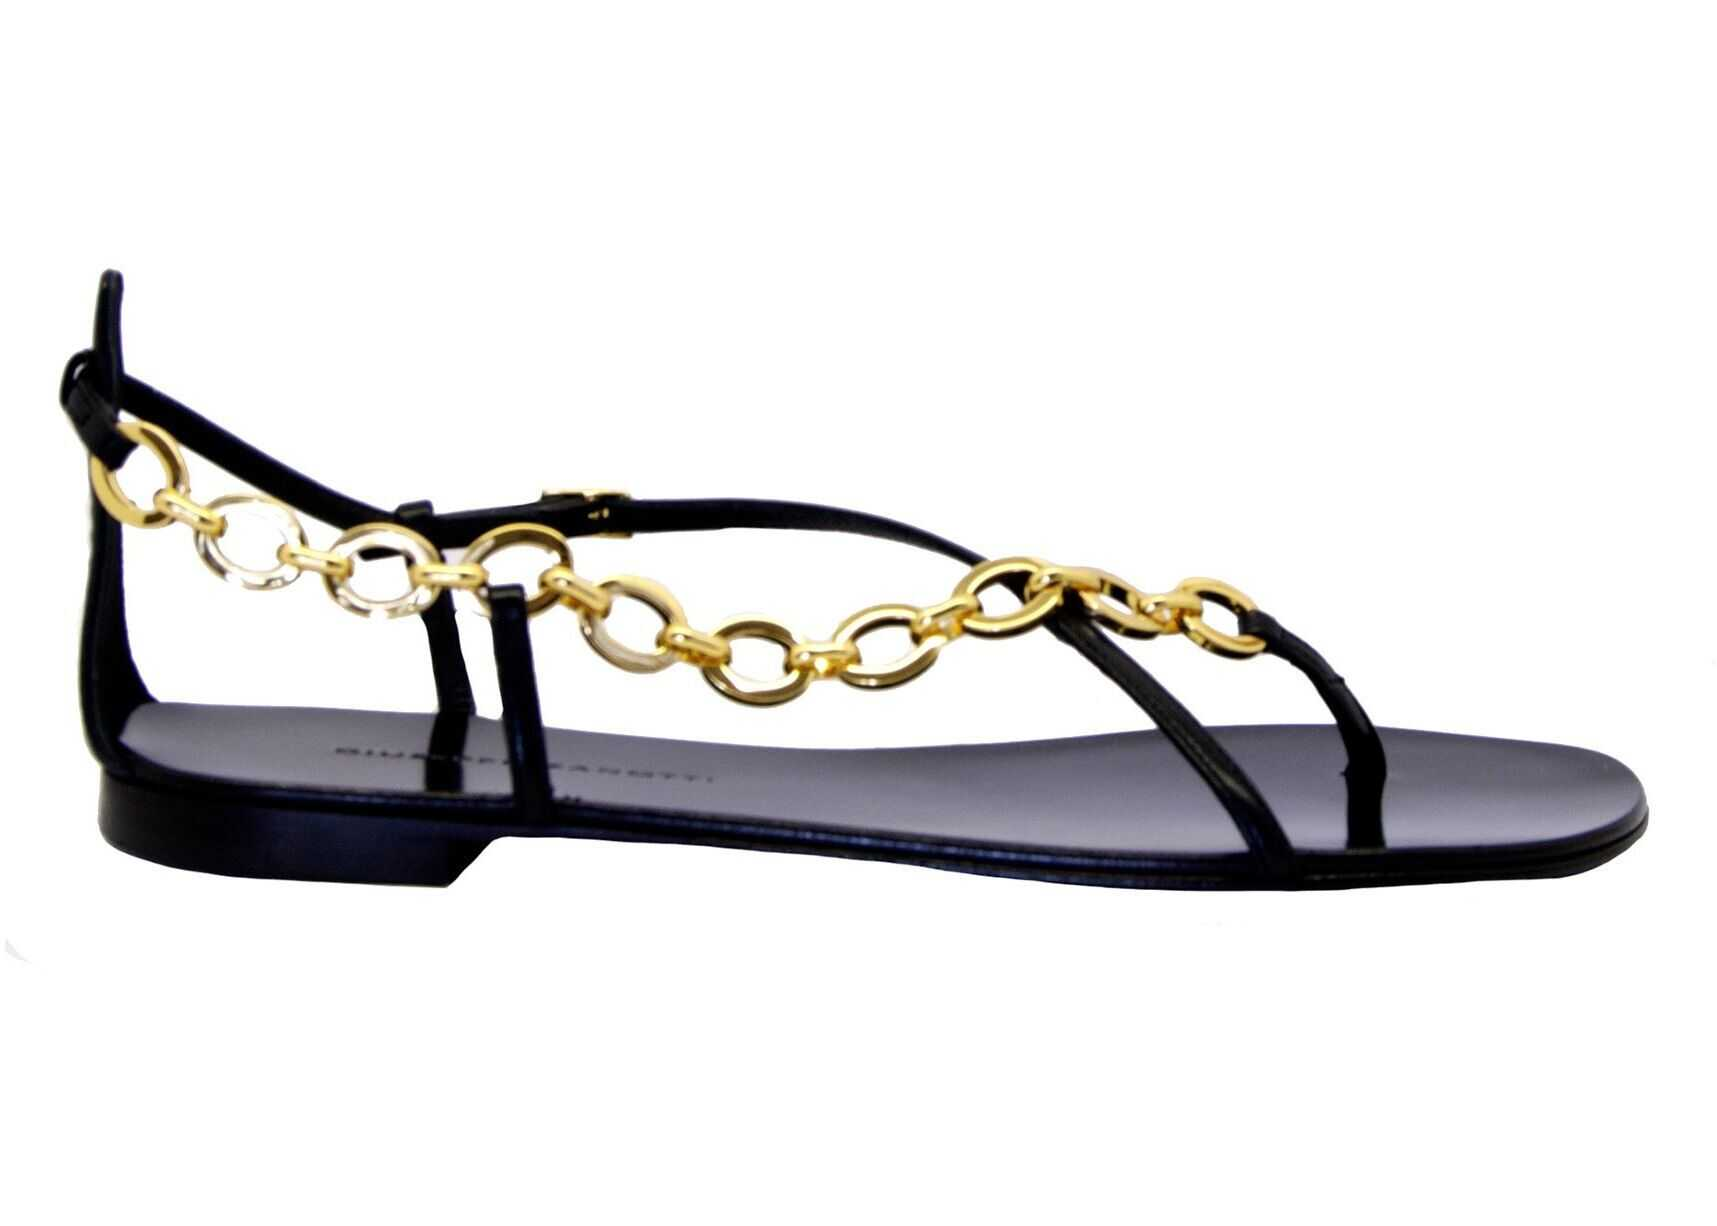 Giuseppe Zanotti Leather Sandals BLACK